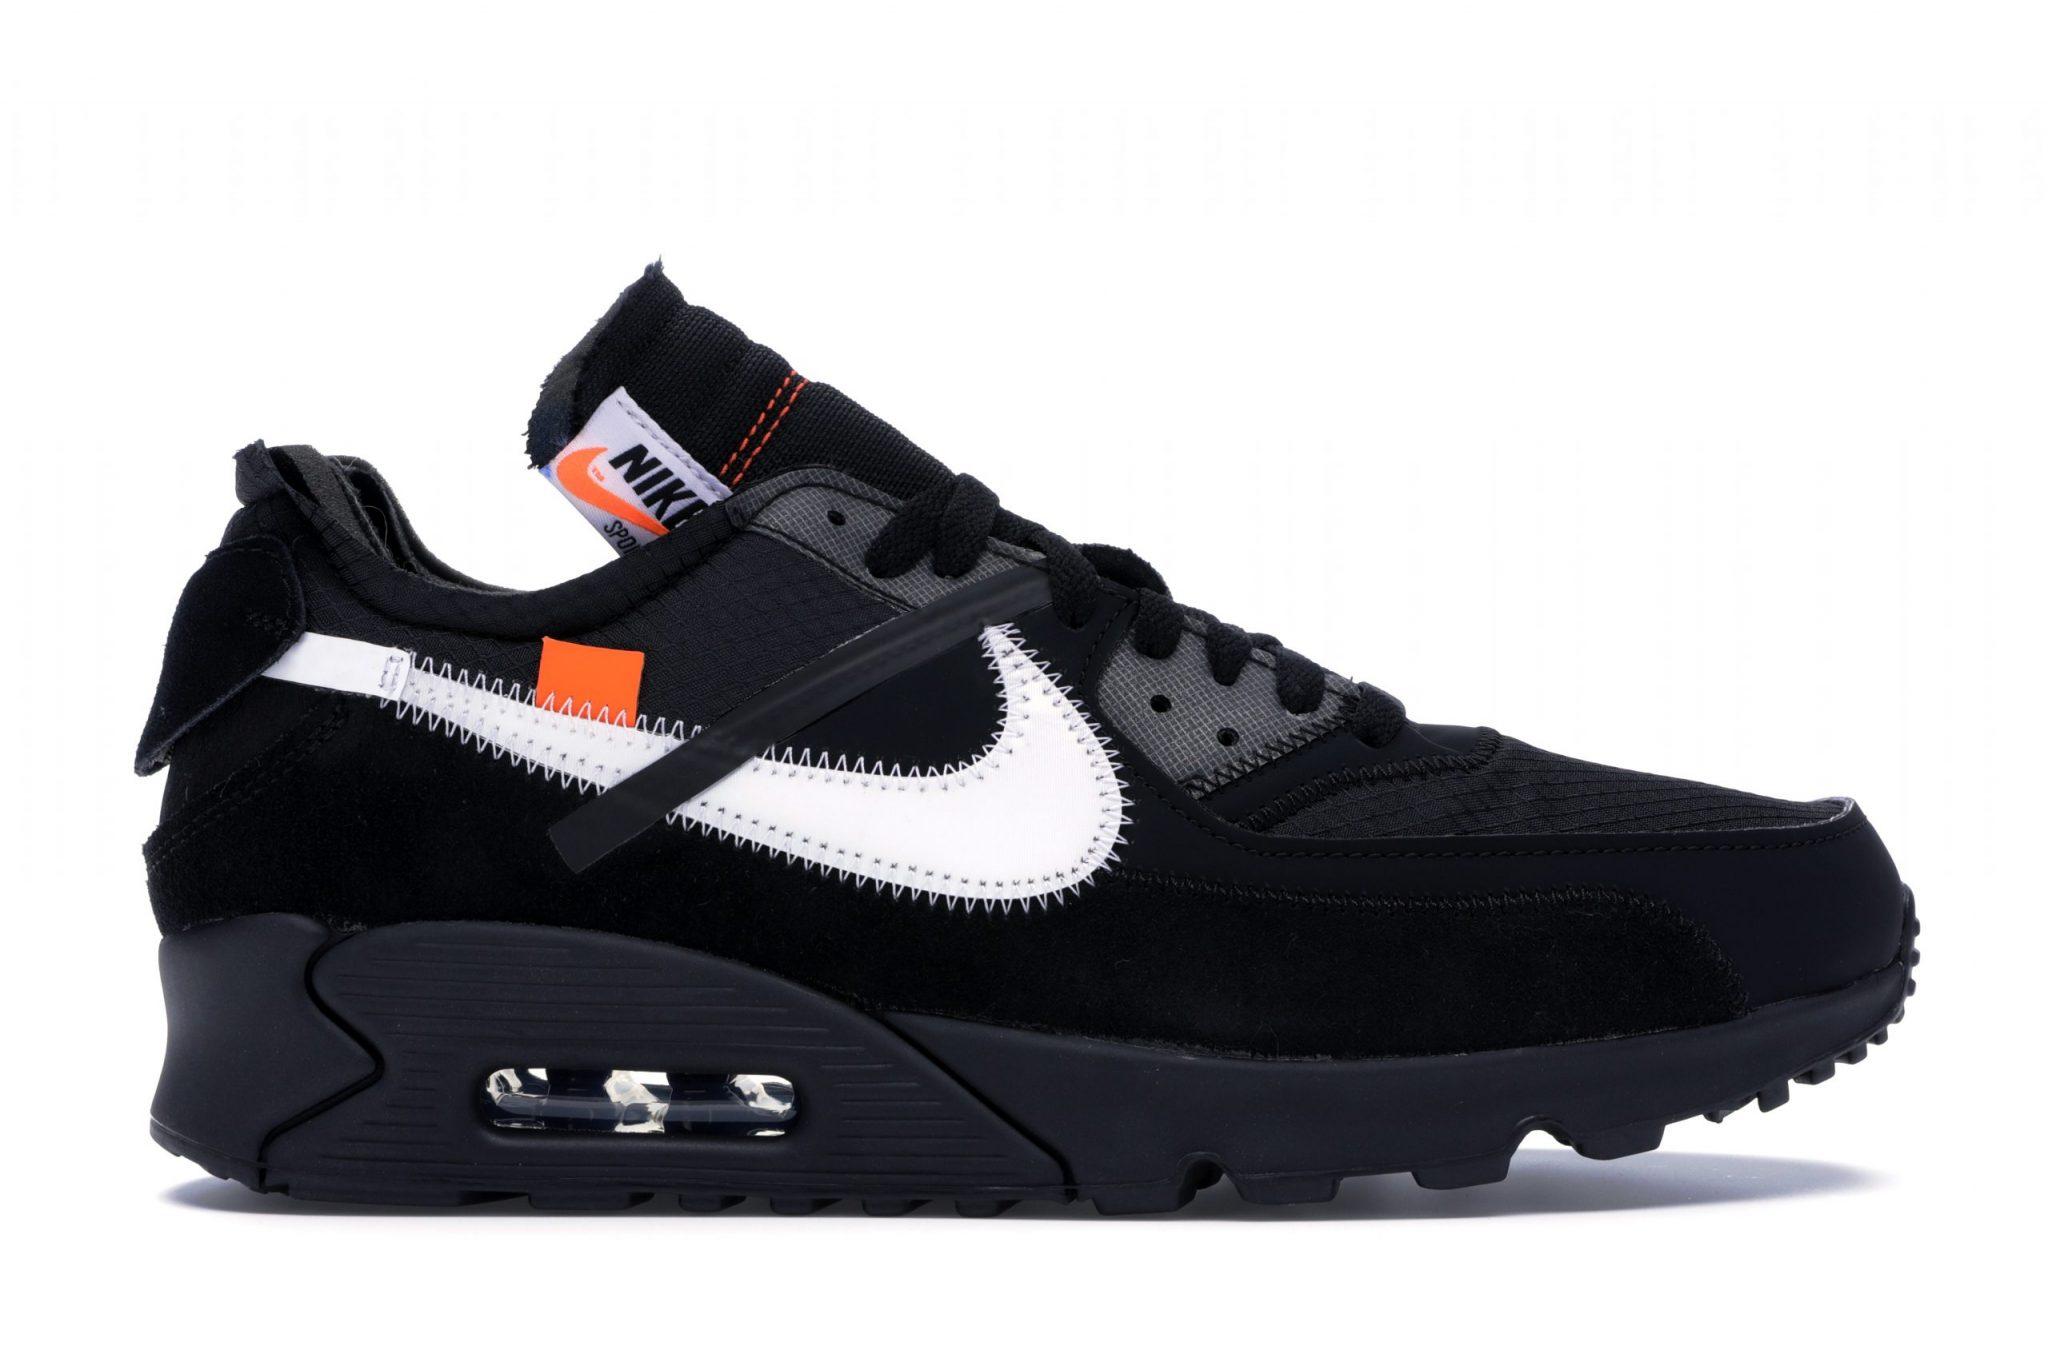 Nike-Air-Max-90-Off-White-Black_01